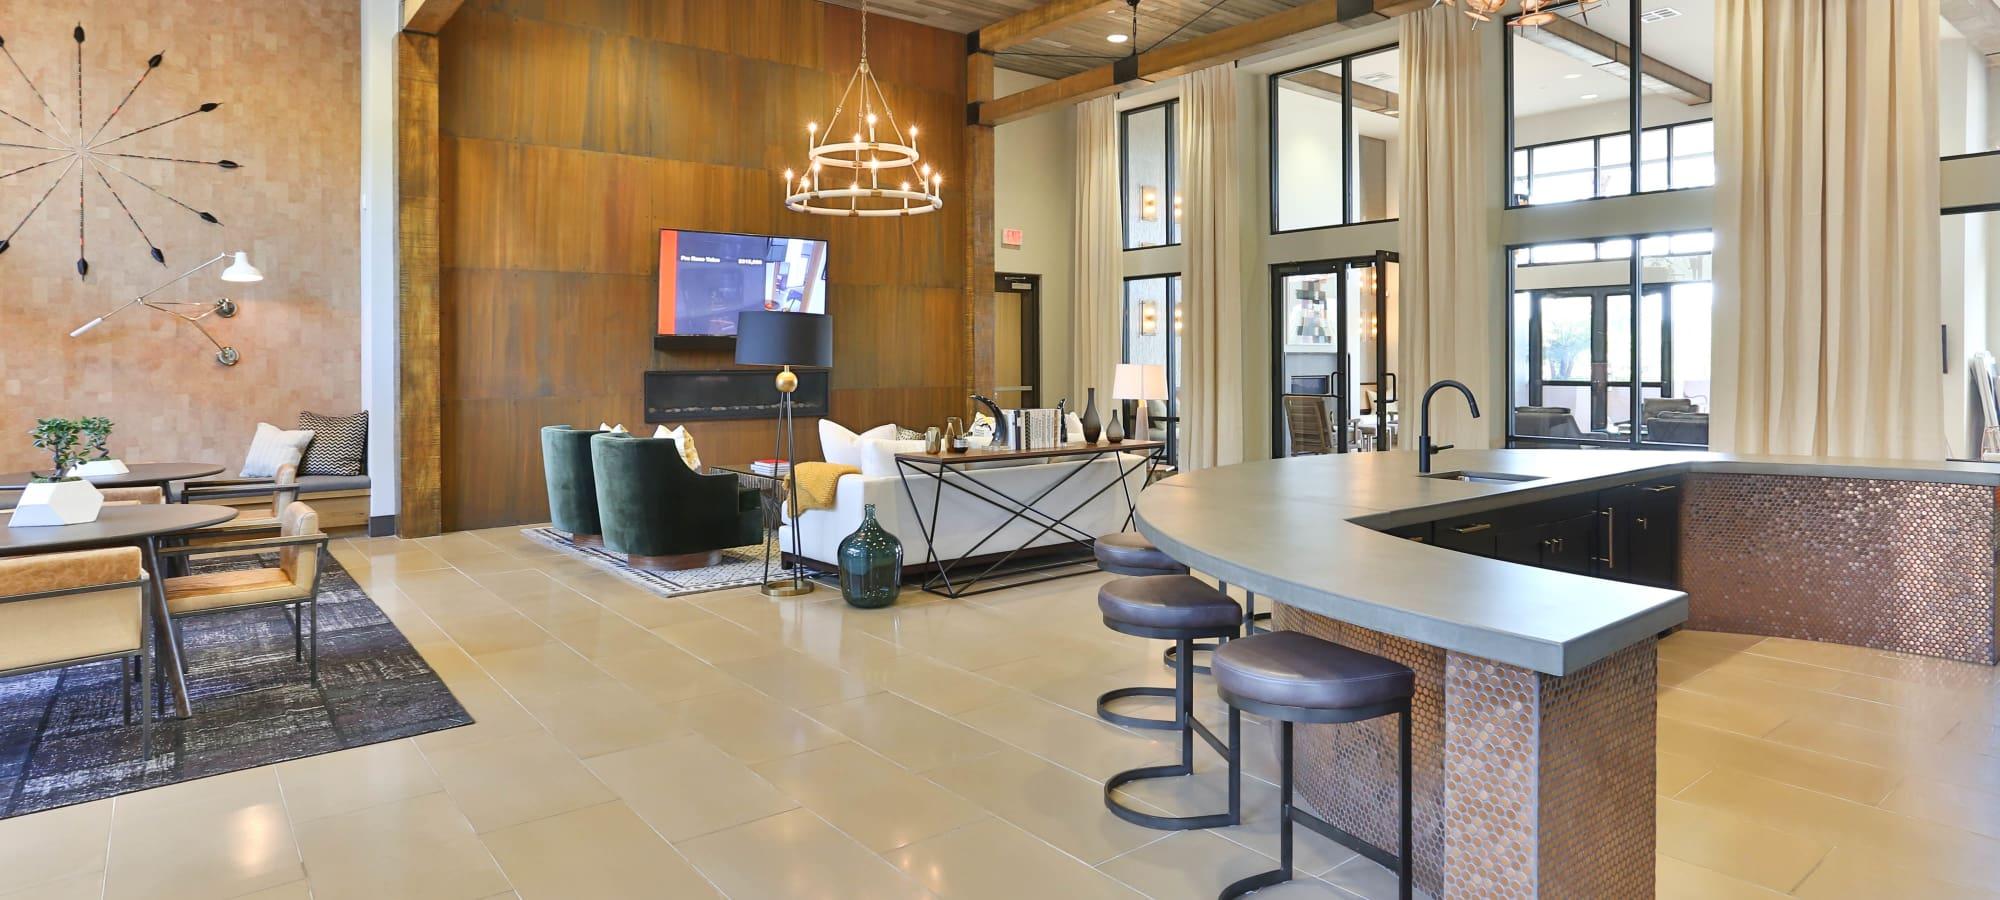 Lobby interior at Avant at Fashion Center in Chandler, Arizona